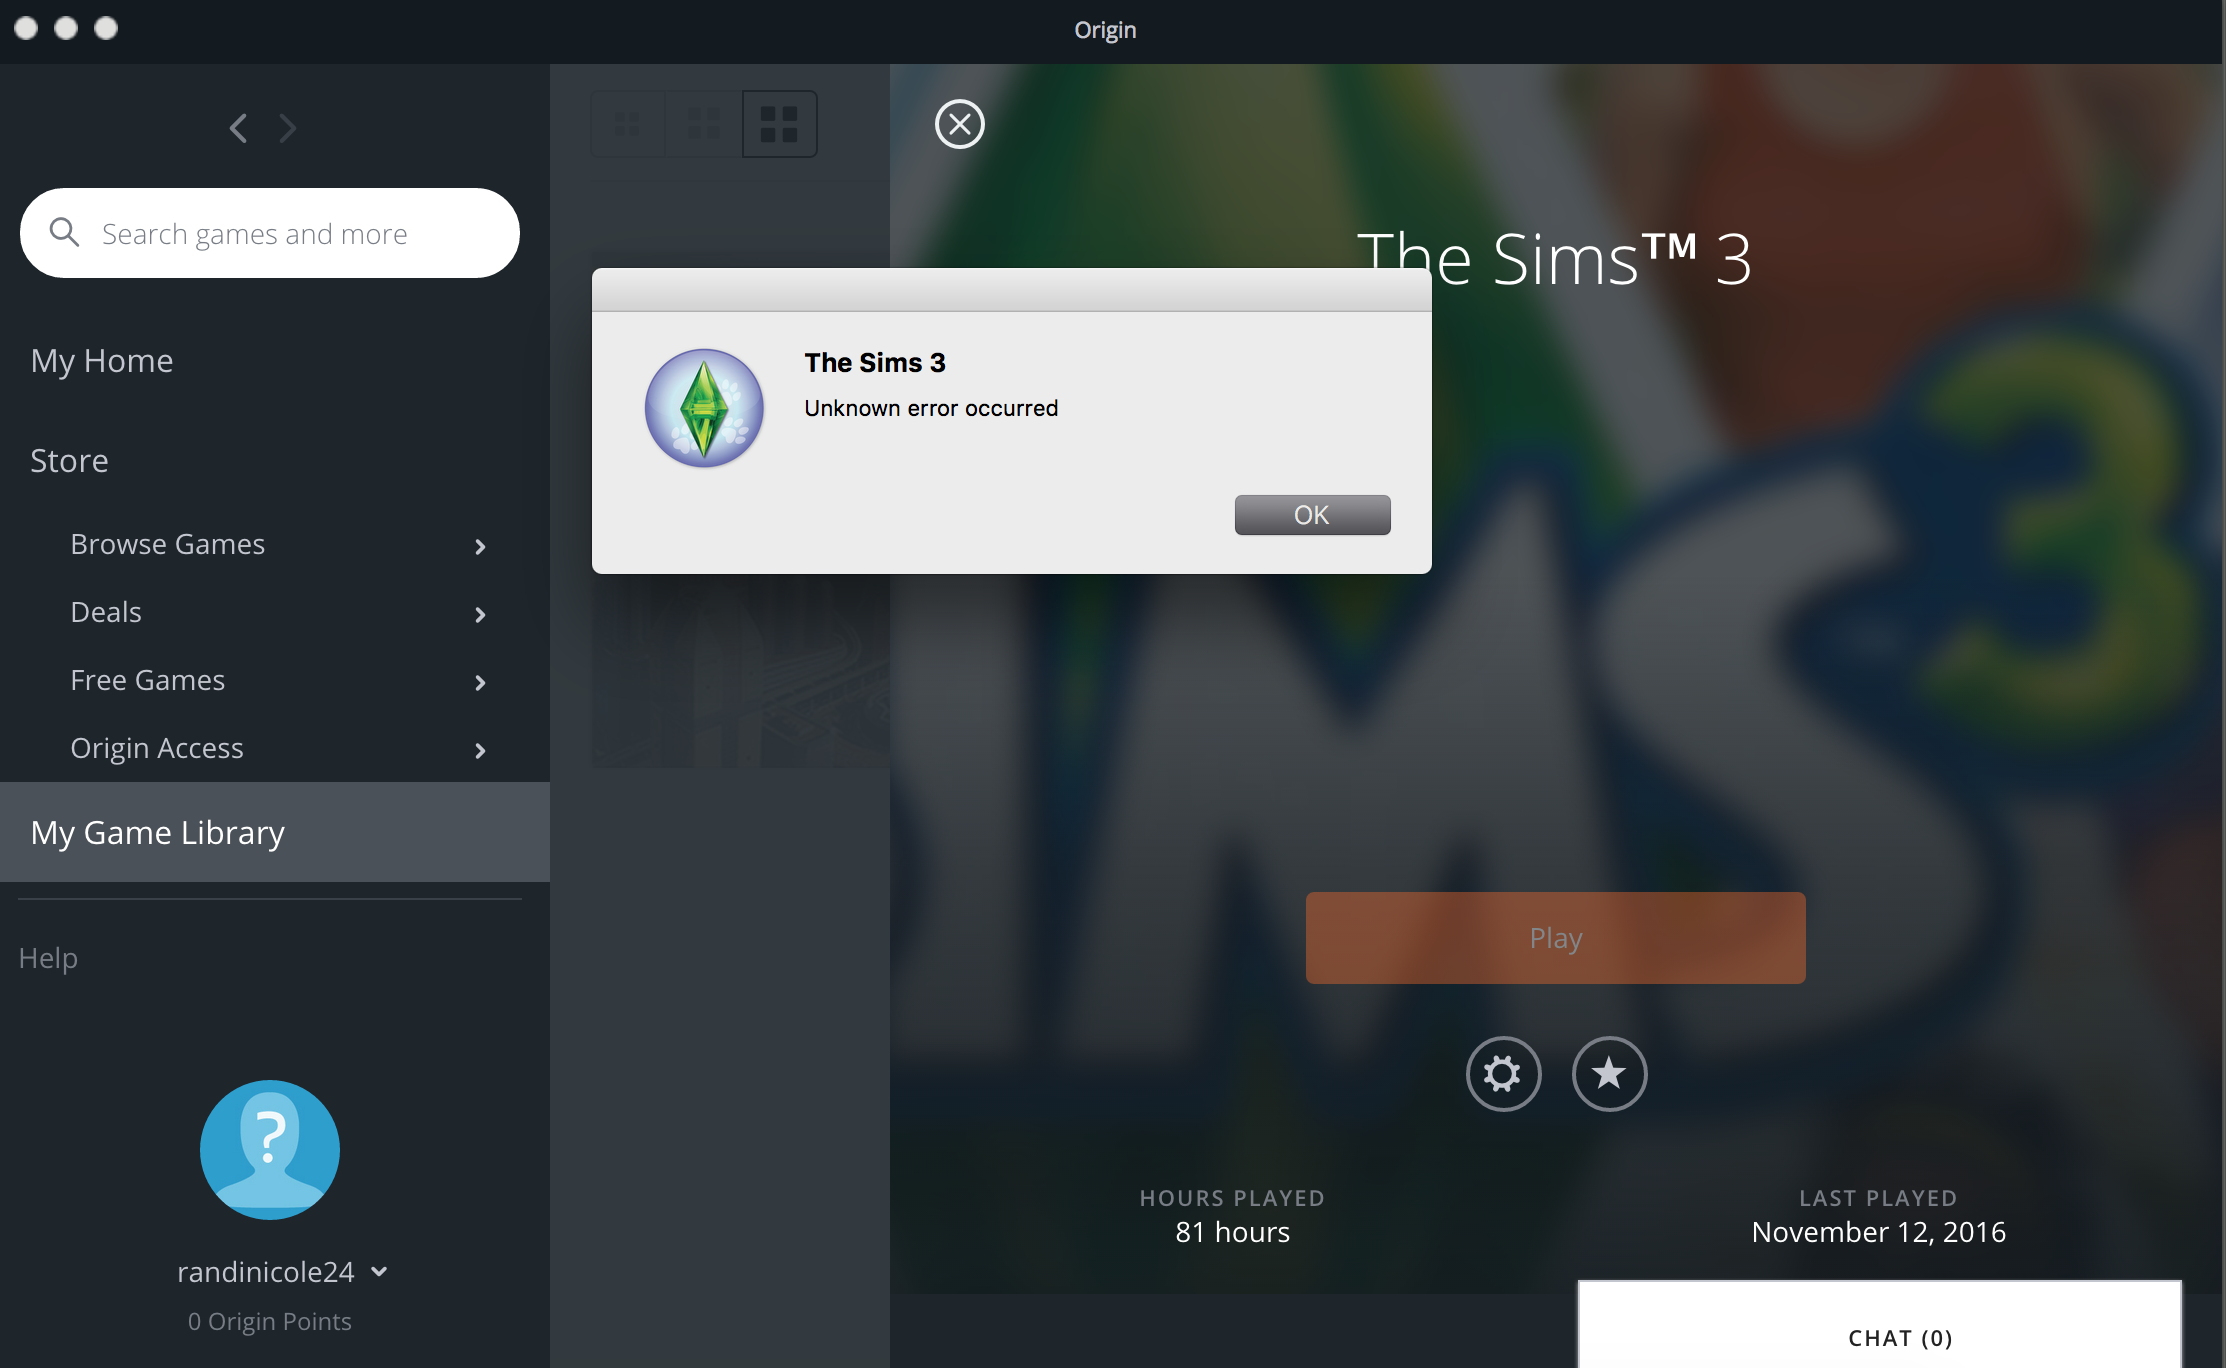 sims 3 won't launch from origin (mac) - Answer HQ